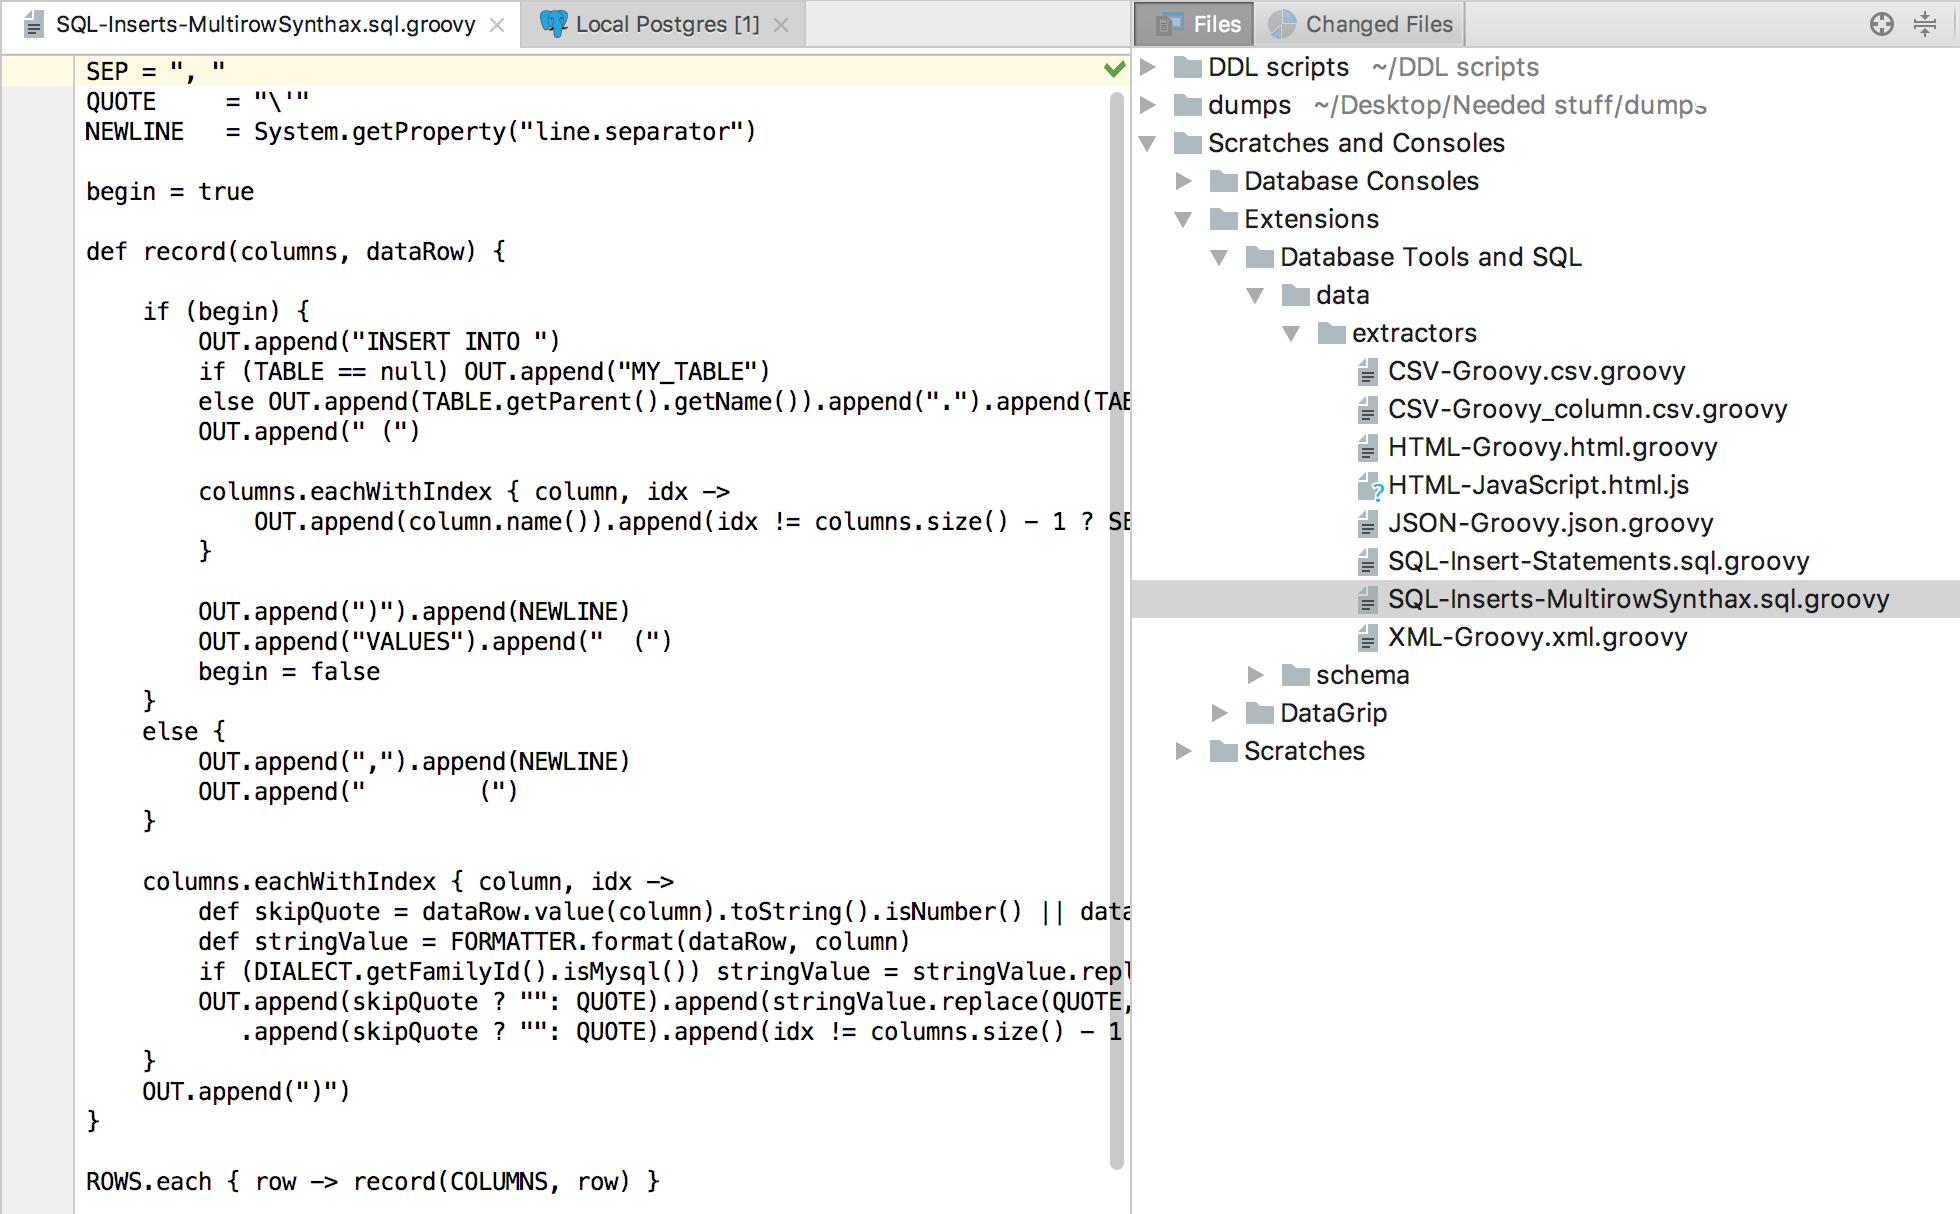 How to export data in DataGrip - Help | DataGrip